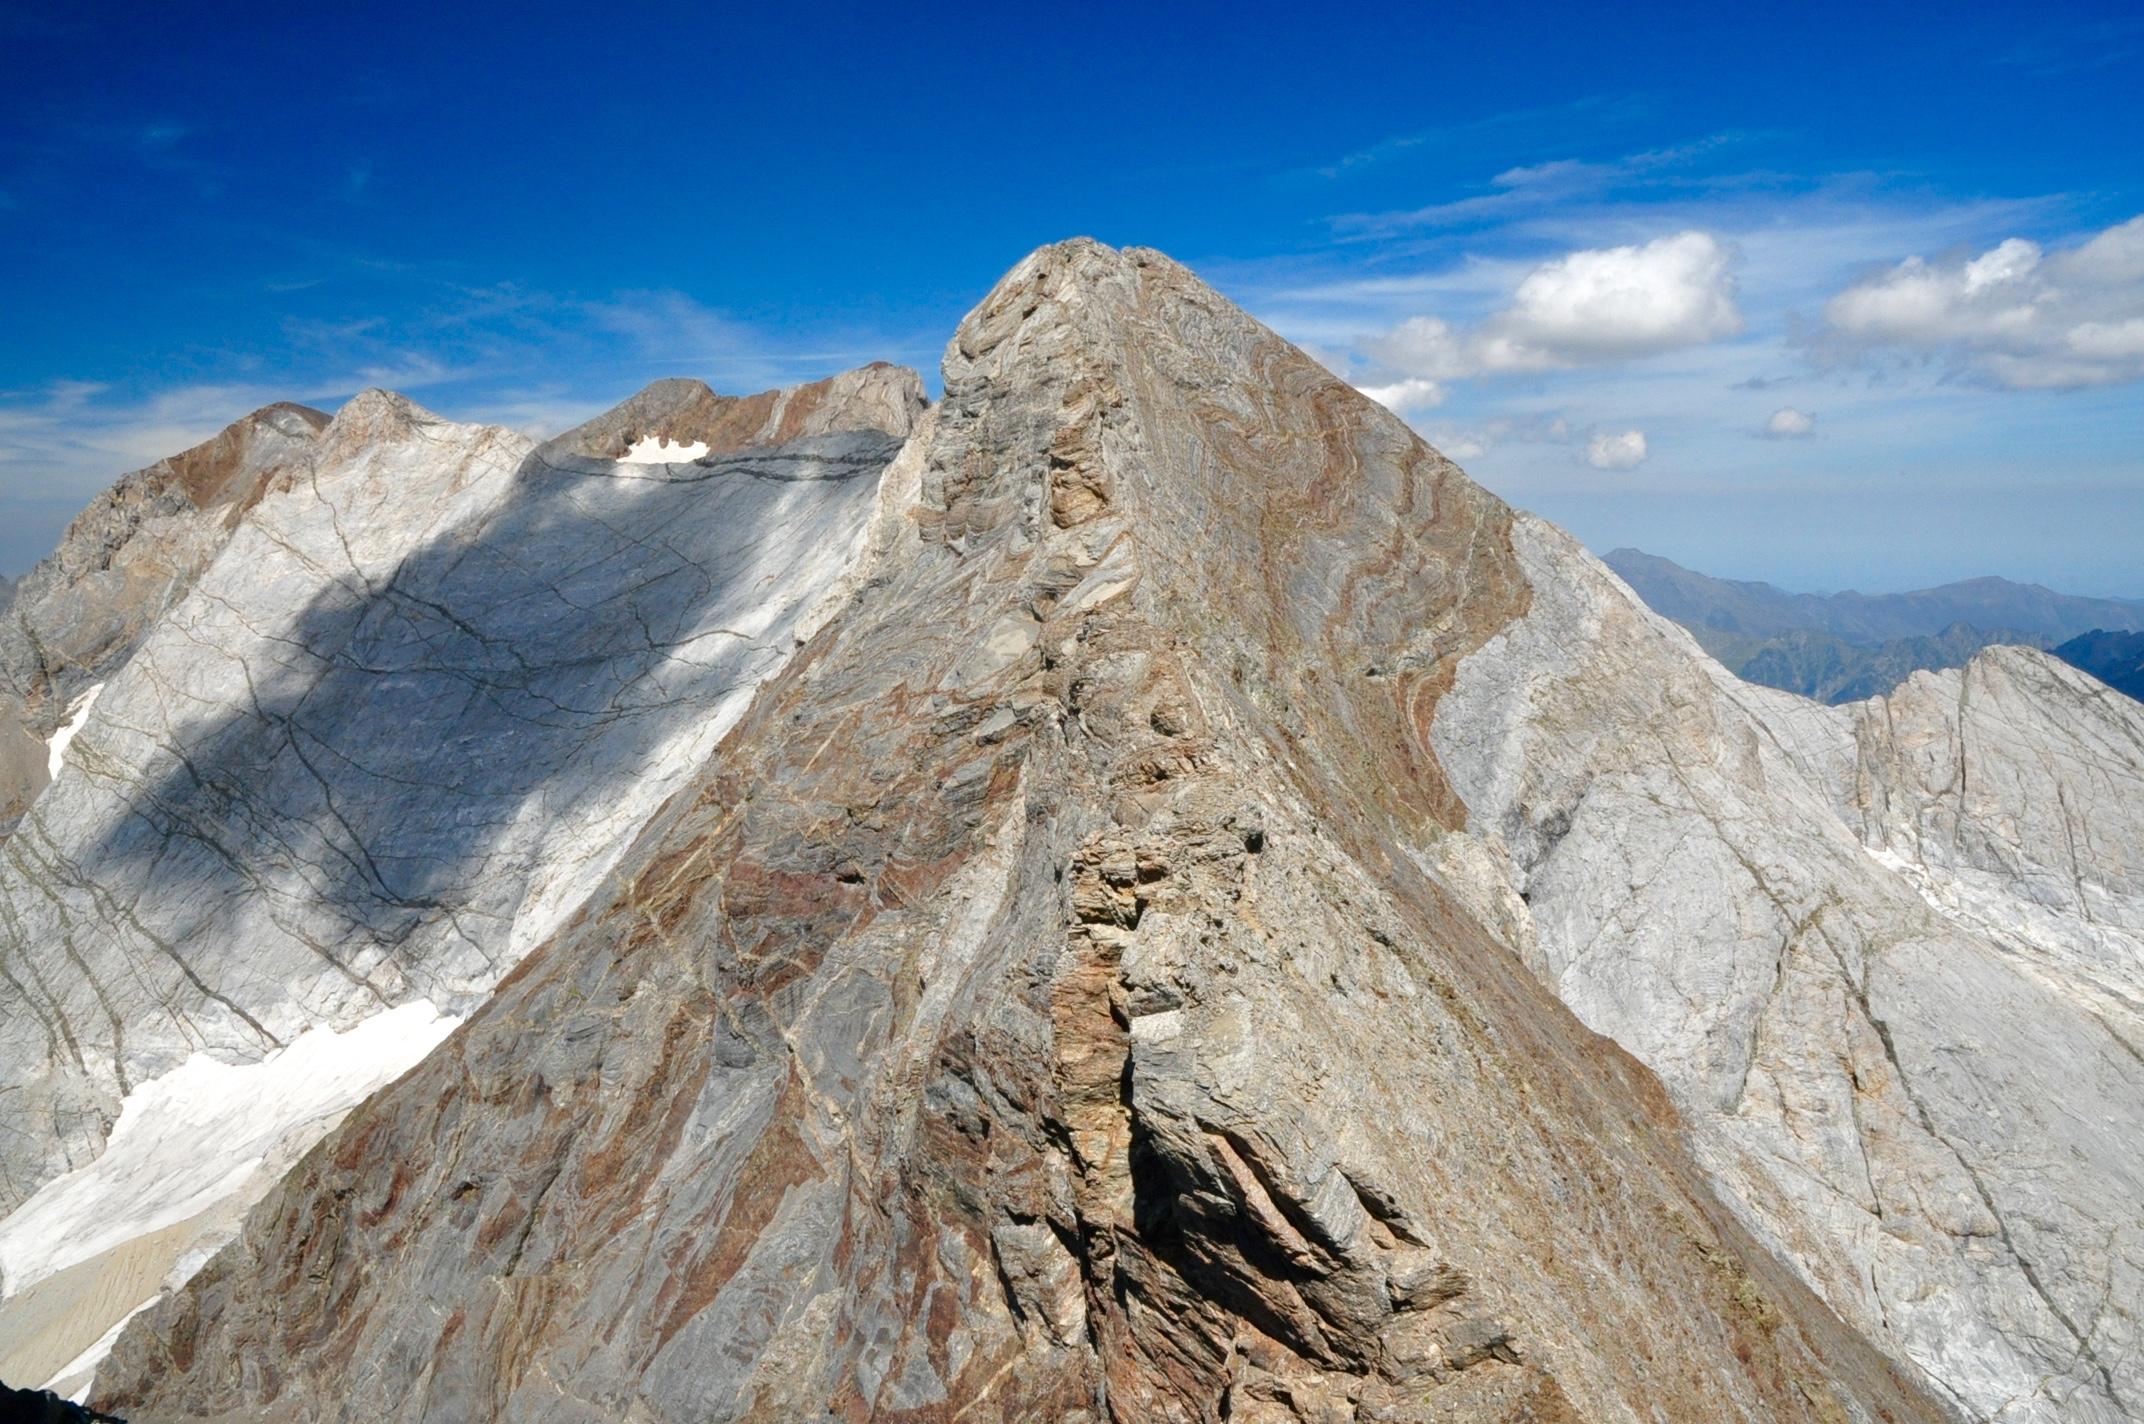 Pic de Montferrat